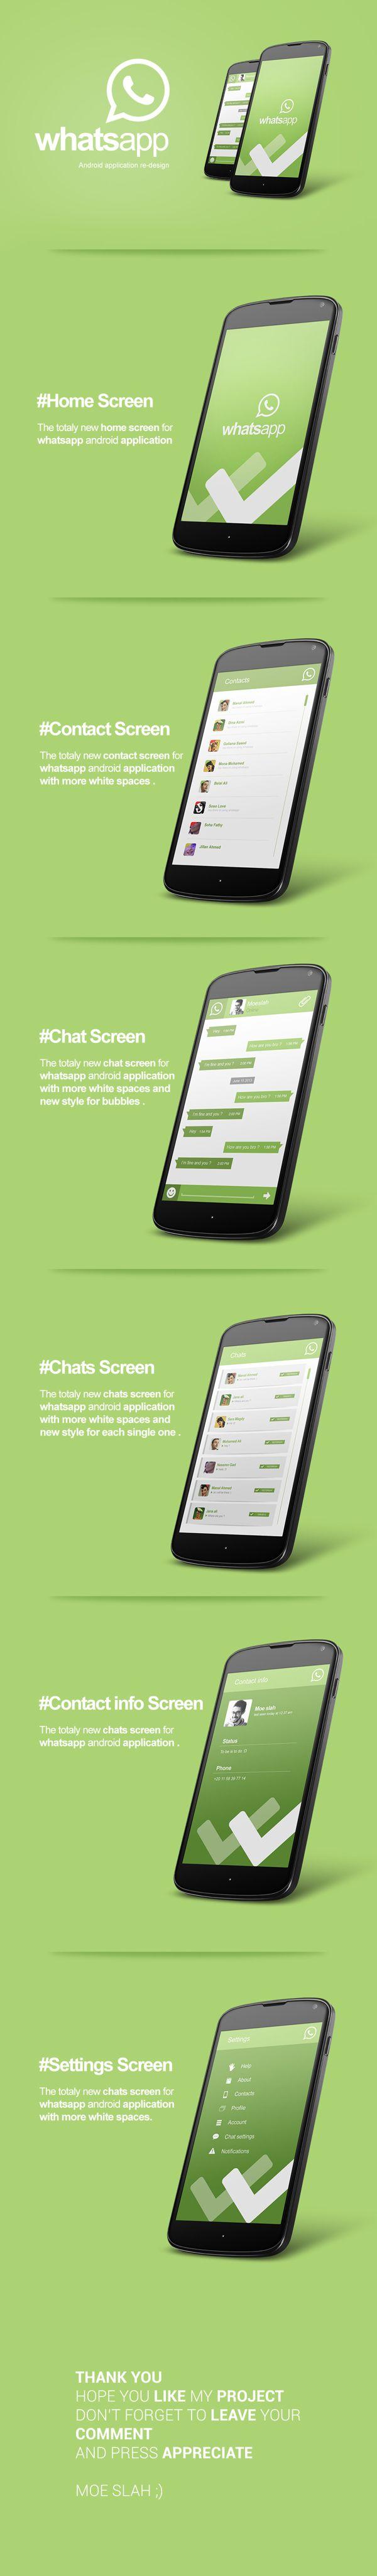 whatsapp android app re design by moe slah via behance